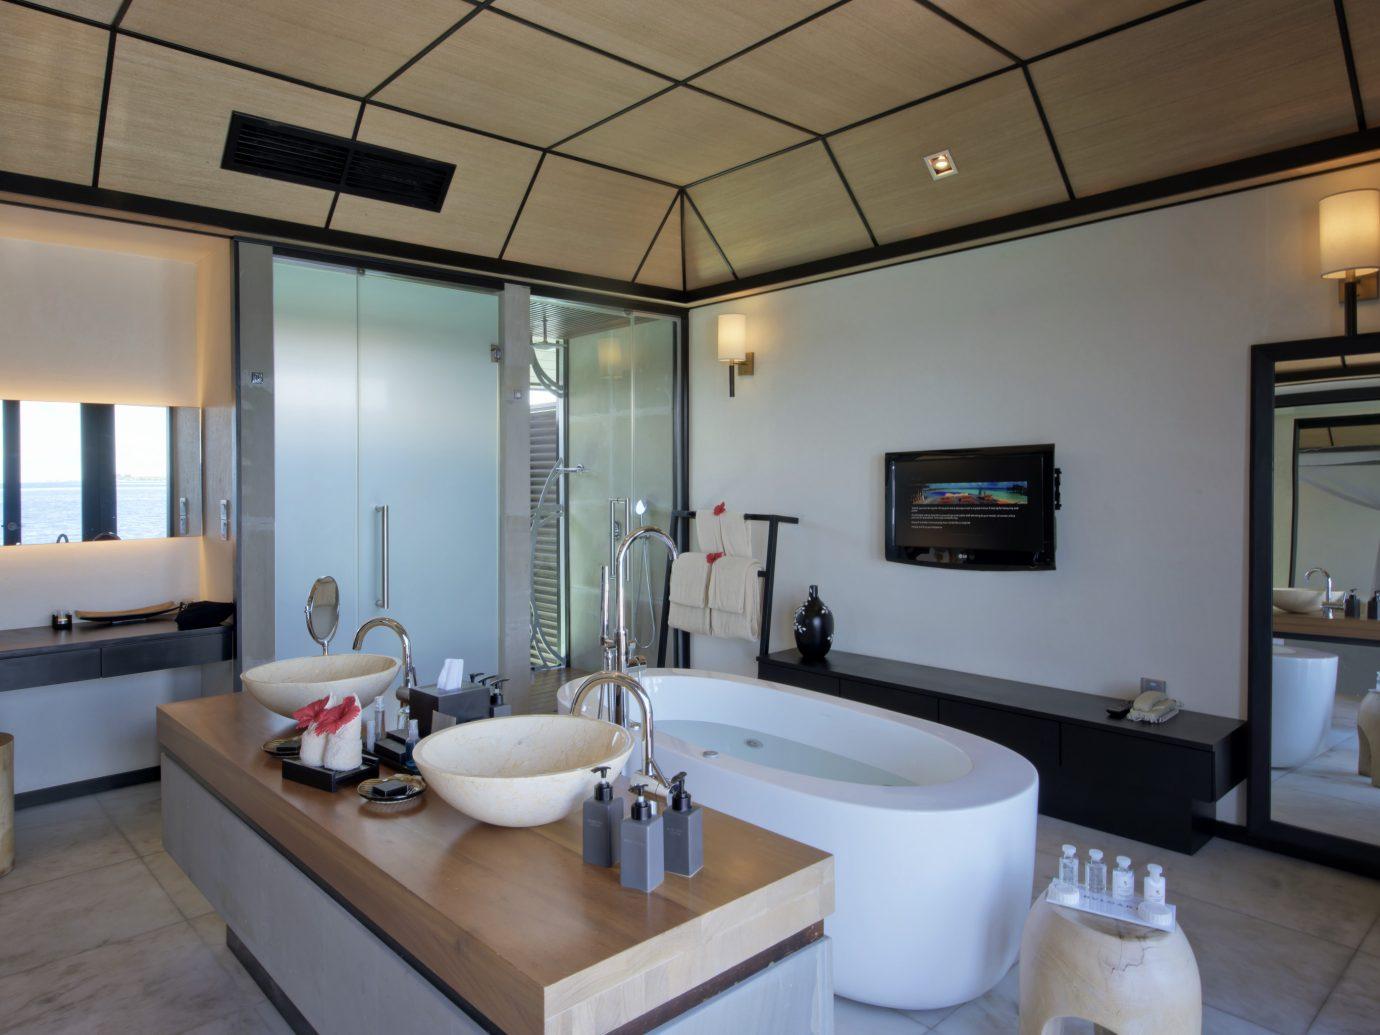 Bathroom at Lily Beach, Maldives